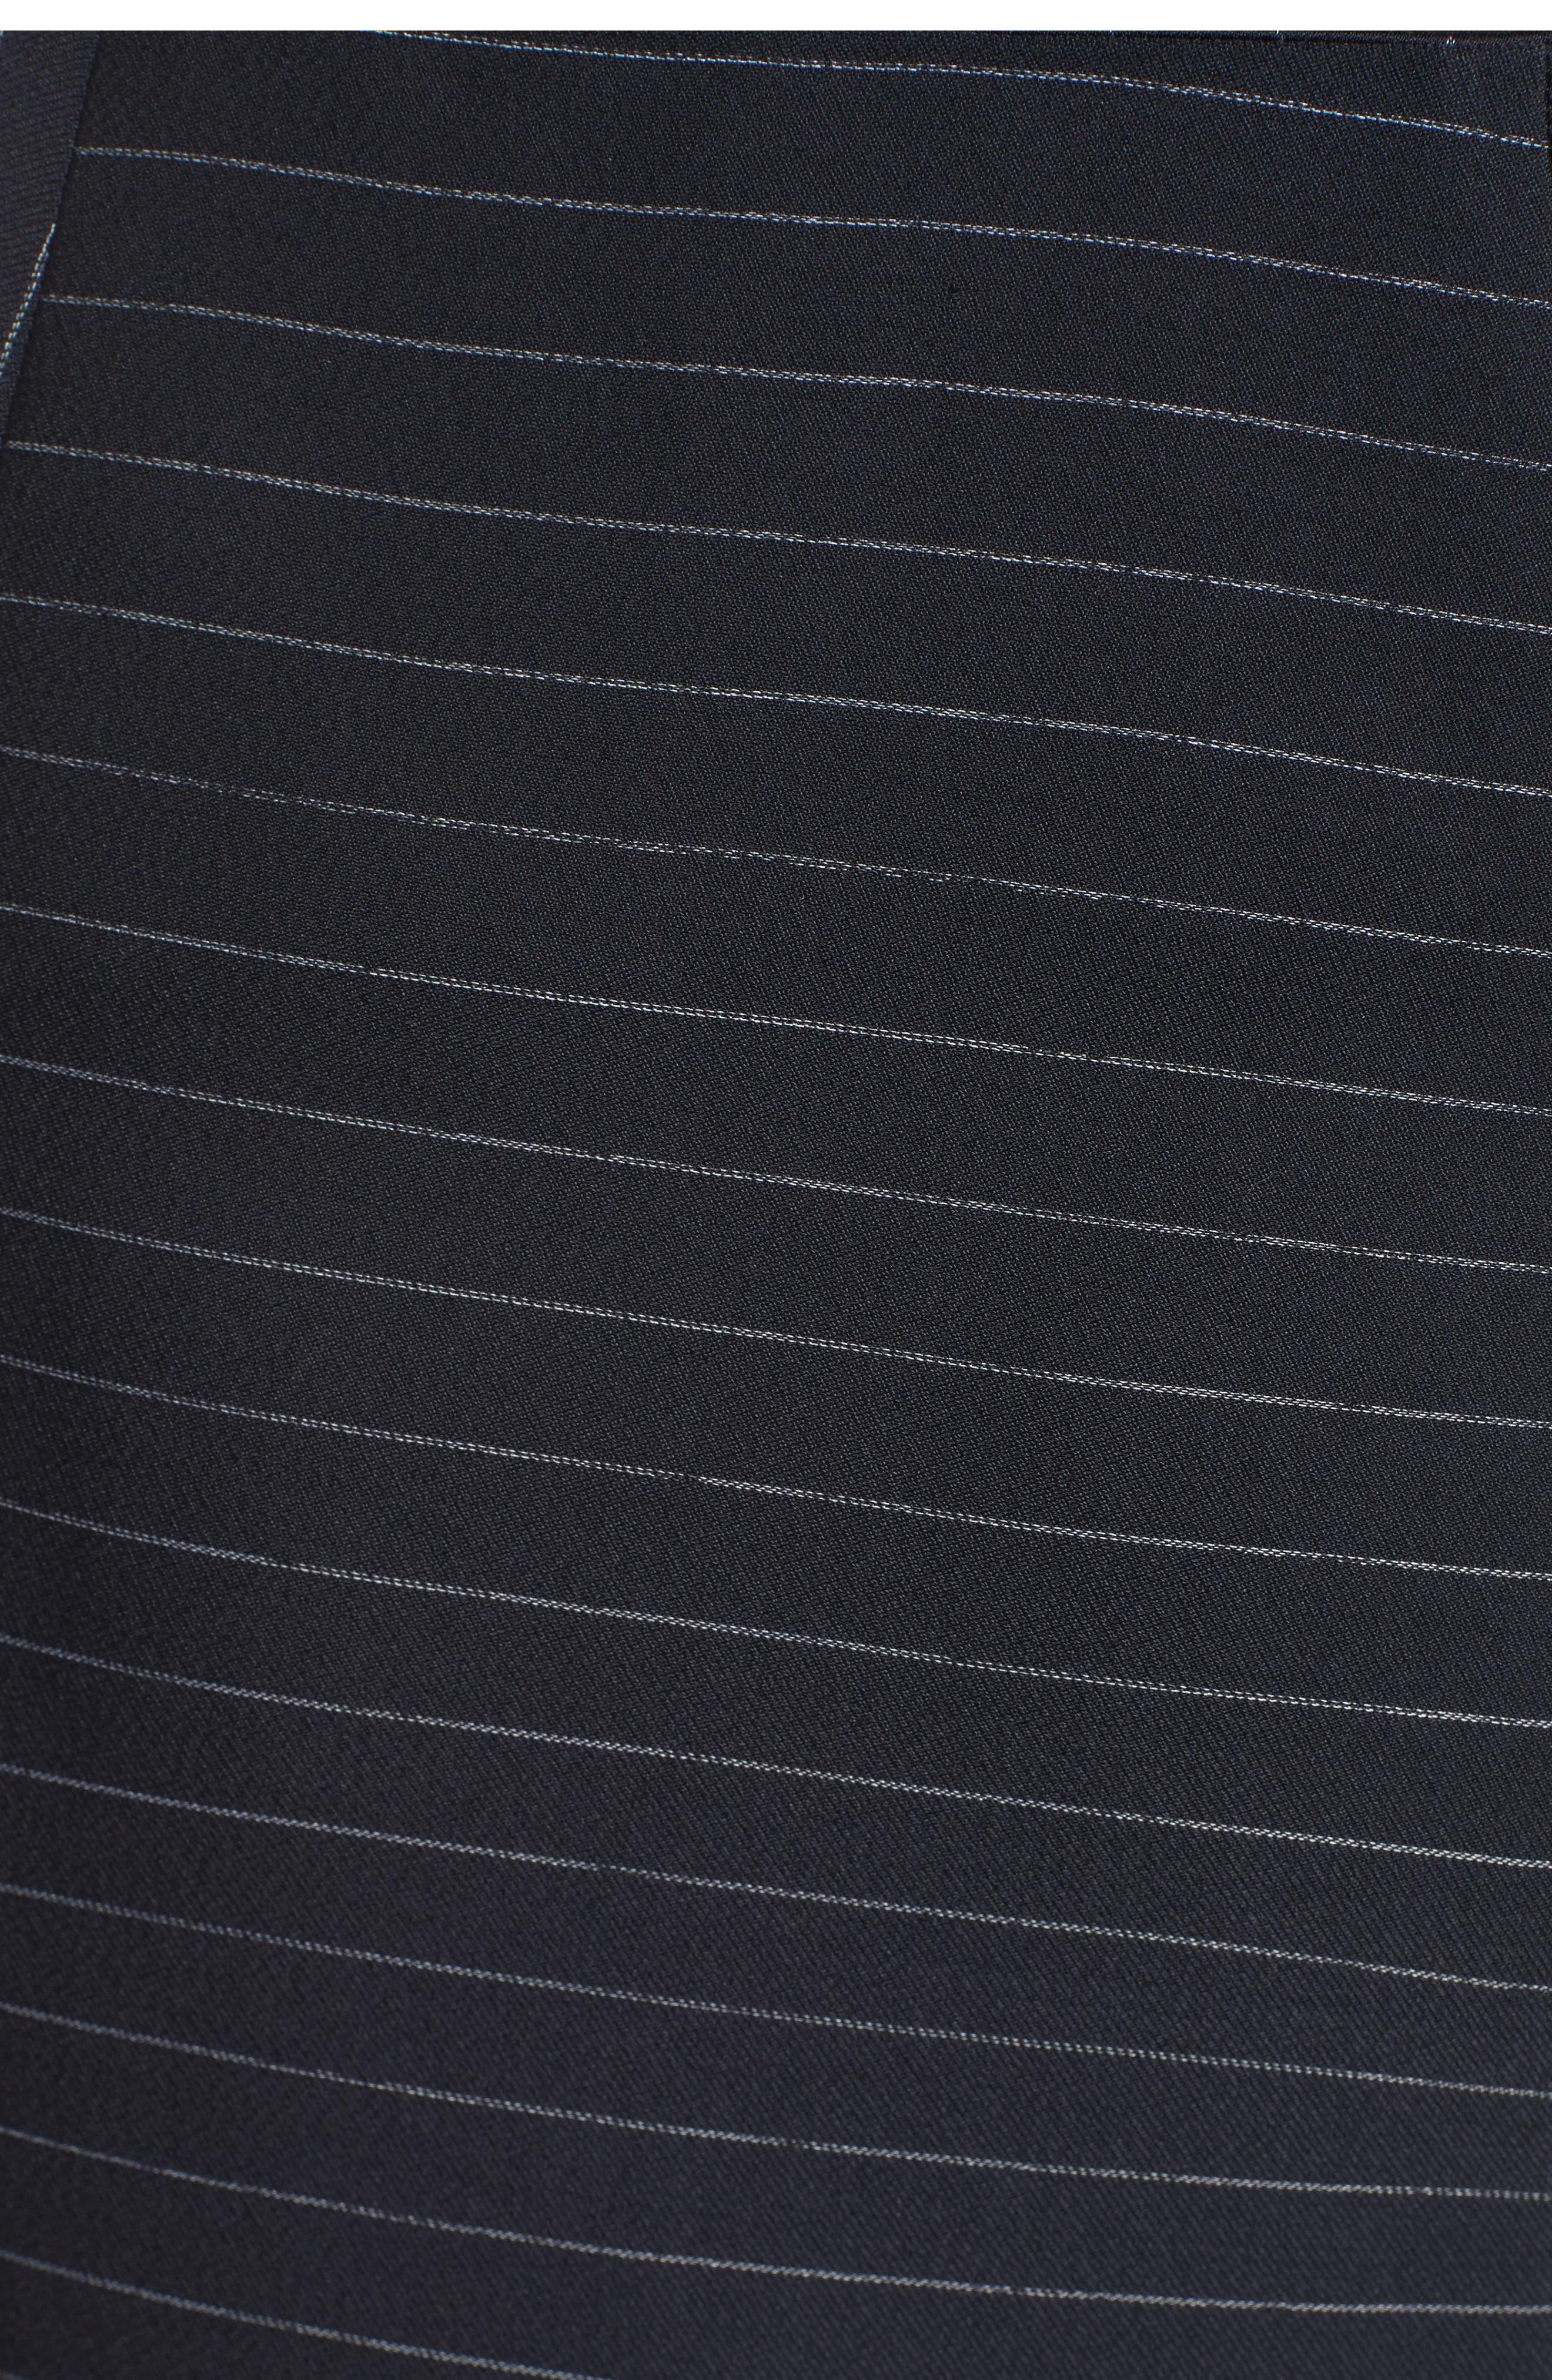 Pinstripe Stretch Asymmetrical Skirt,                             Alternate thumbnail 3, color,                             Black/ Chalk